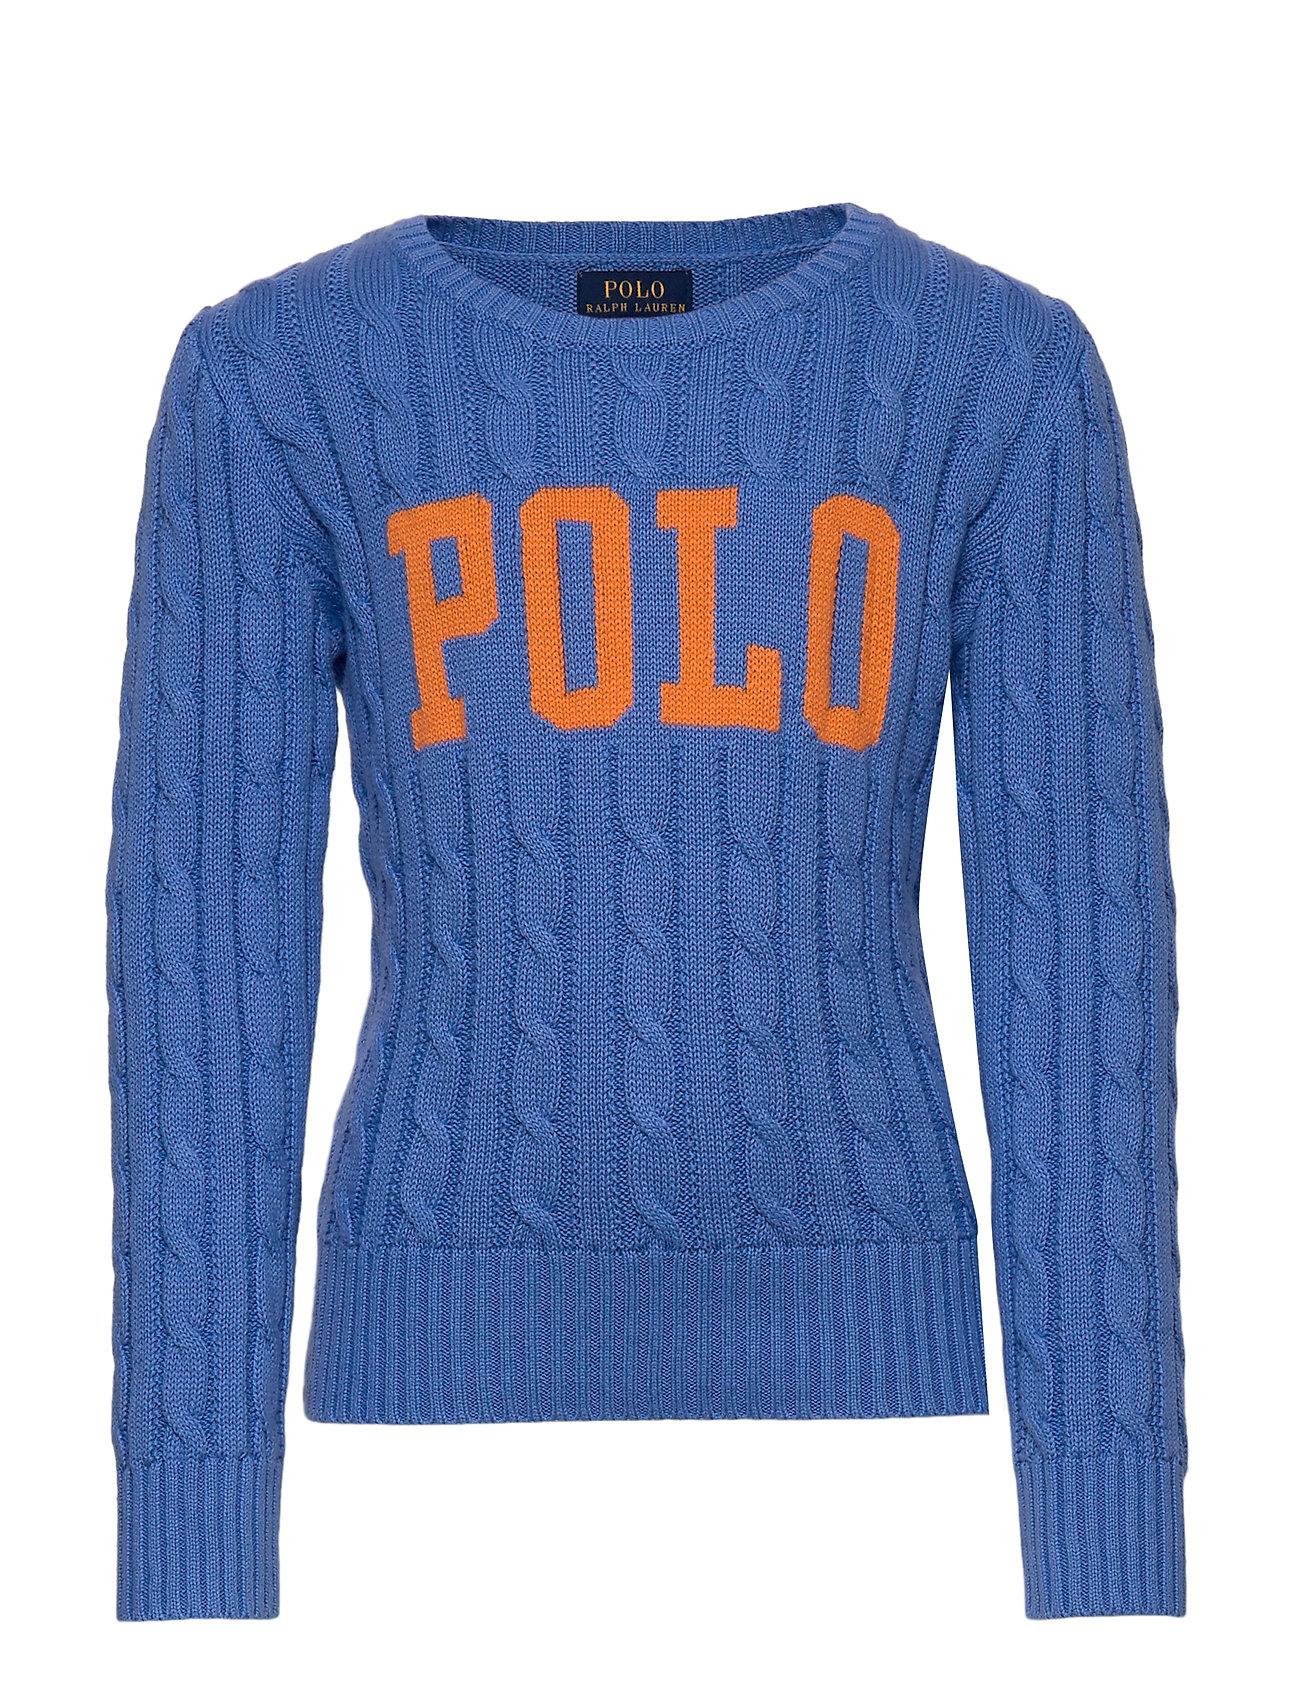 Ralph Lauren Kids Logo Cable-Knit Cotton Sweater - HARBOR ISLAND BLU